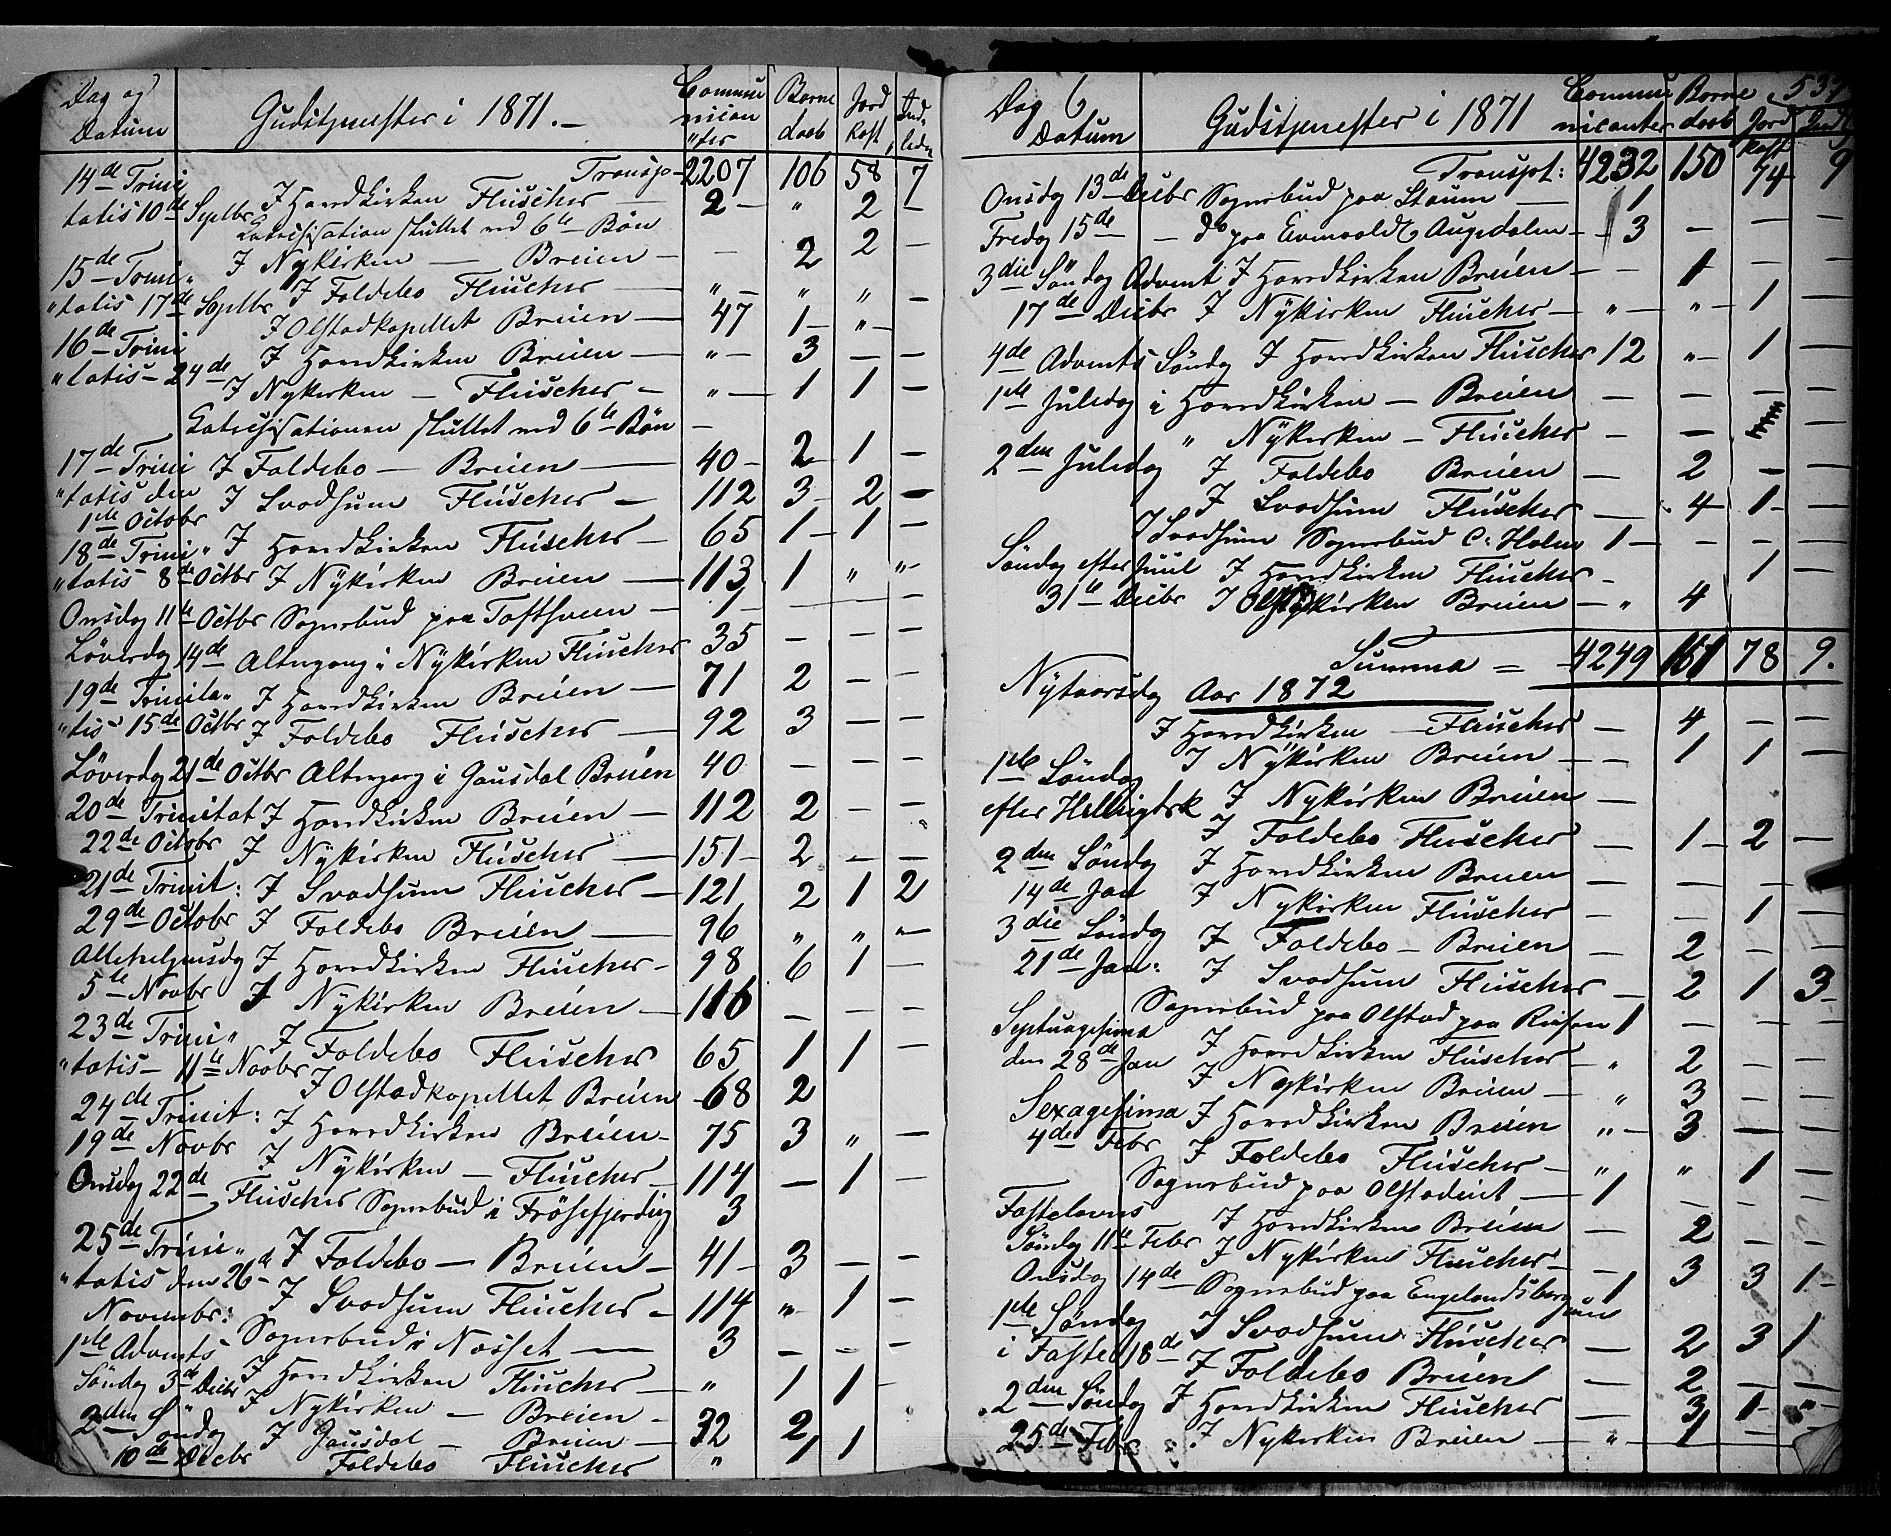 SAH, Gausdal prestekontor, Ministerialbok nr. 9, 1862-1873, s. 537